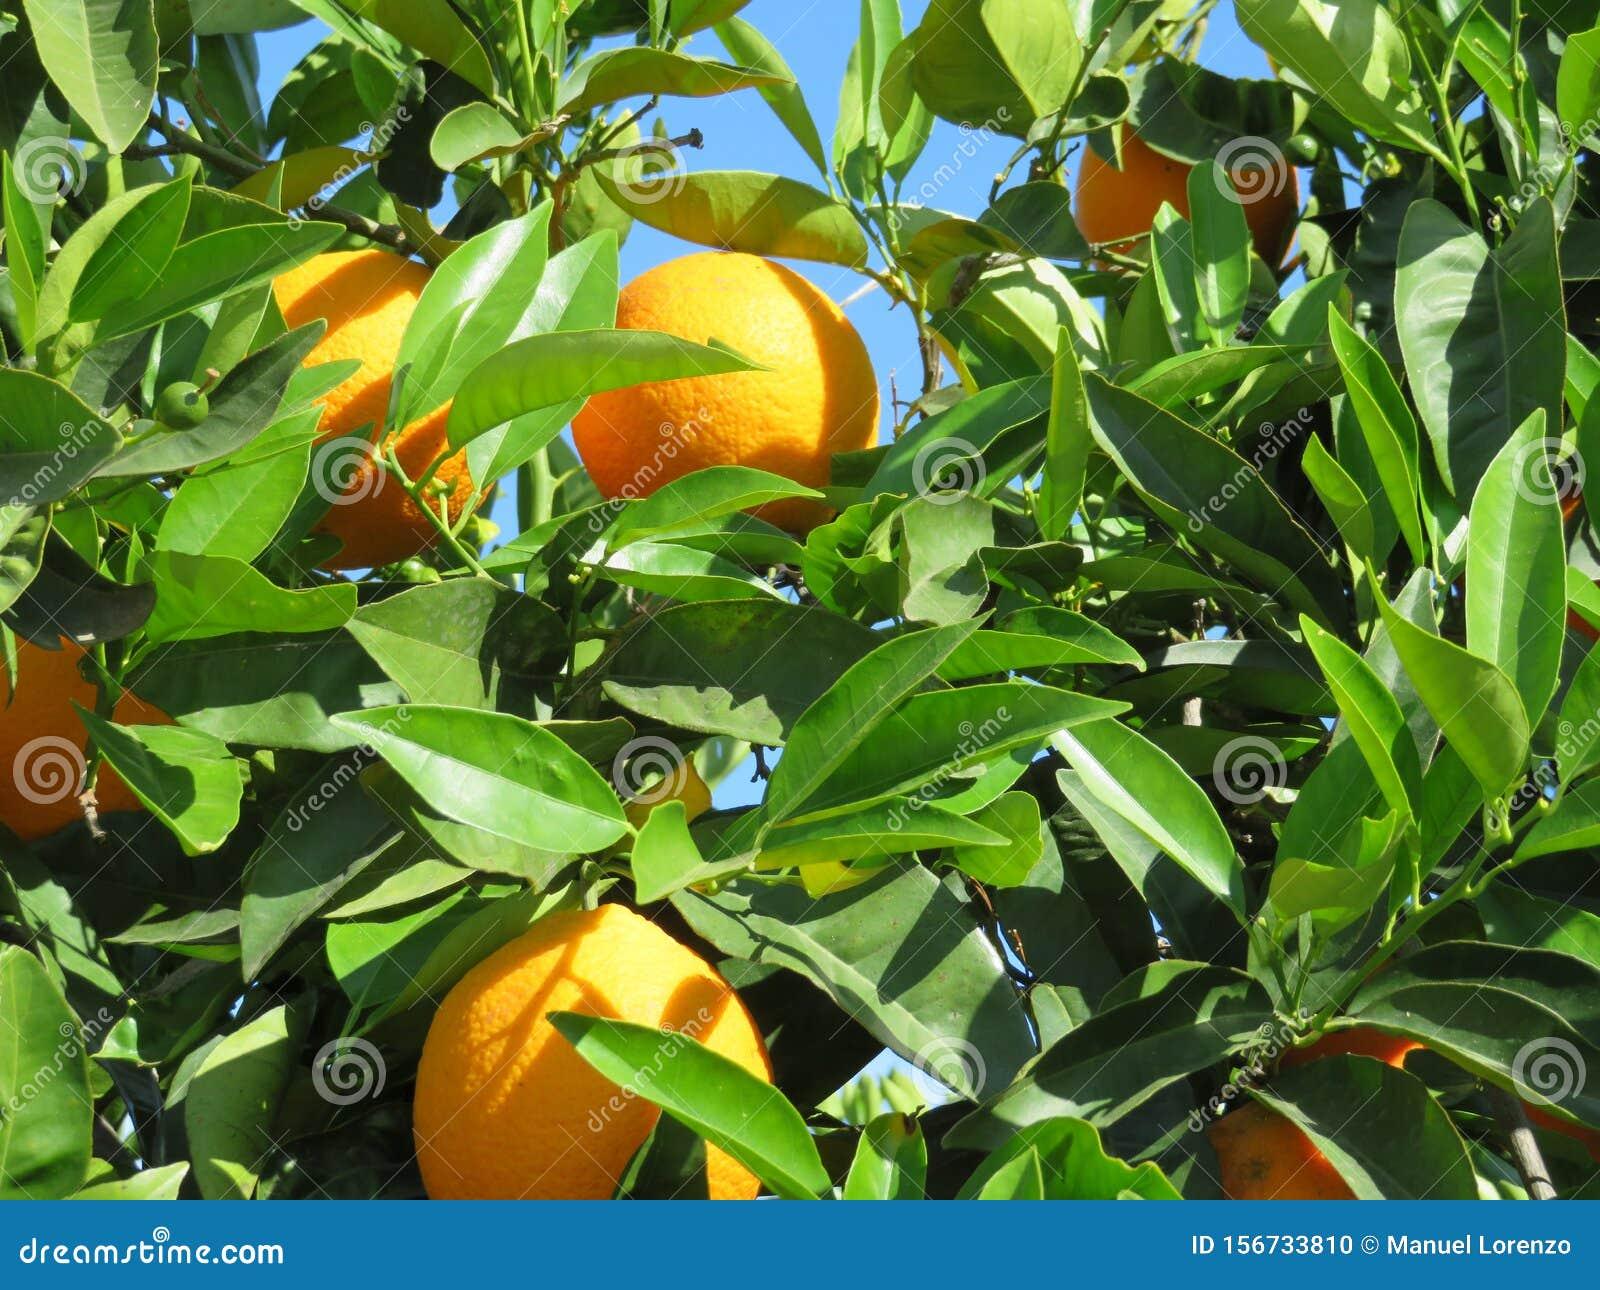 Beautiful Fruit Tree Of Oranges Of Juicy Fruits Stock Photo Image Of Ingredient Diet 156733810